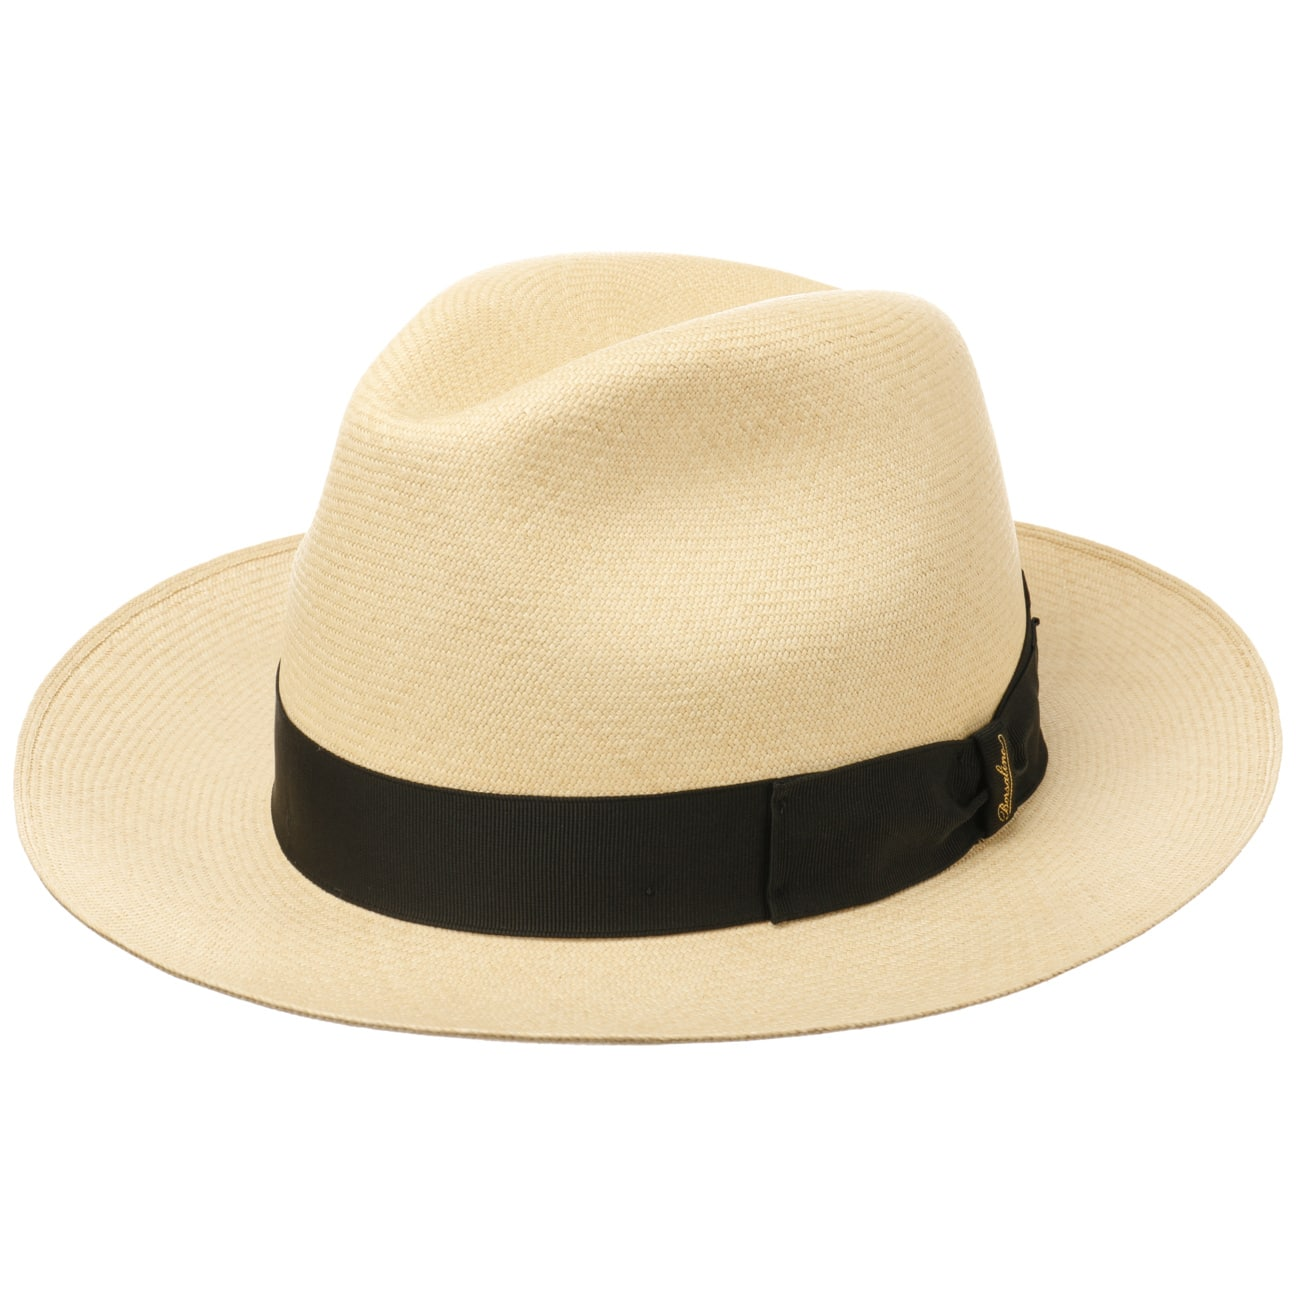 ... Cappello Panama Bogart Premium by Borsalino - natura 5 ... 44f81377ff26